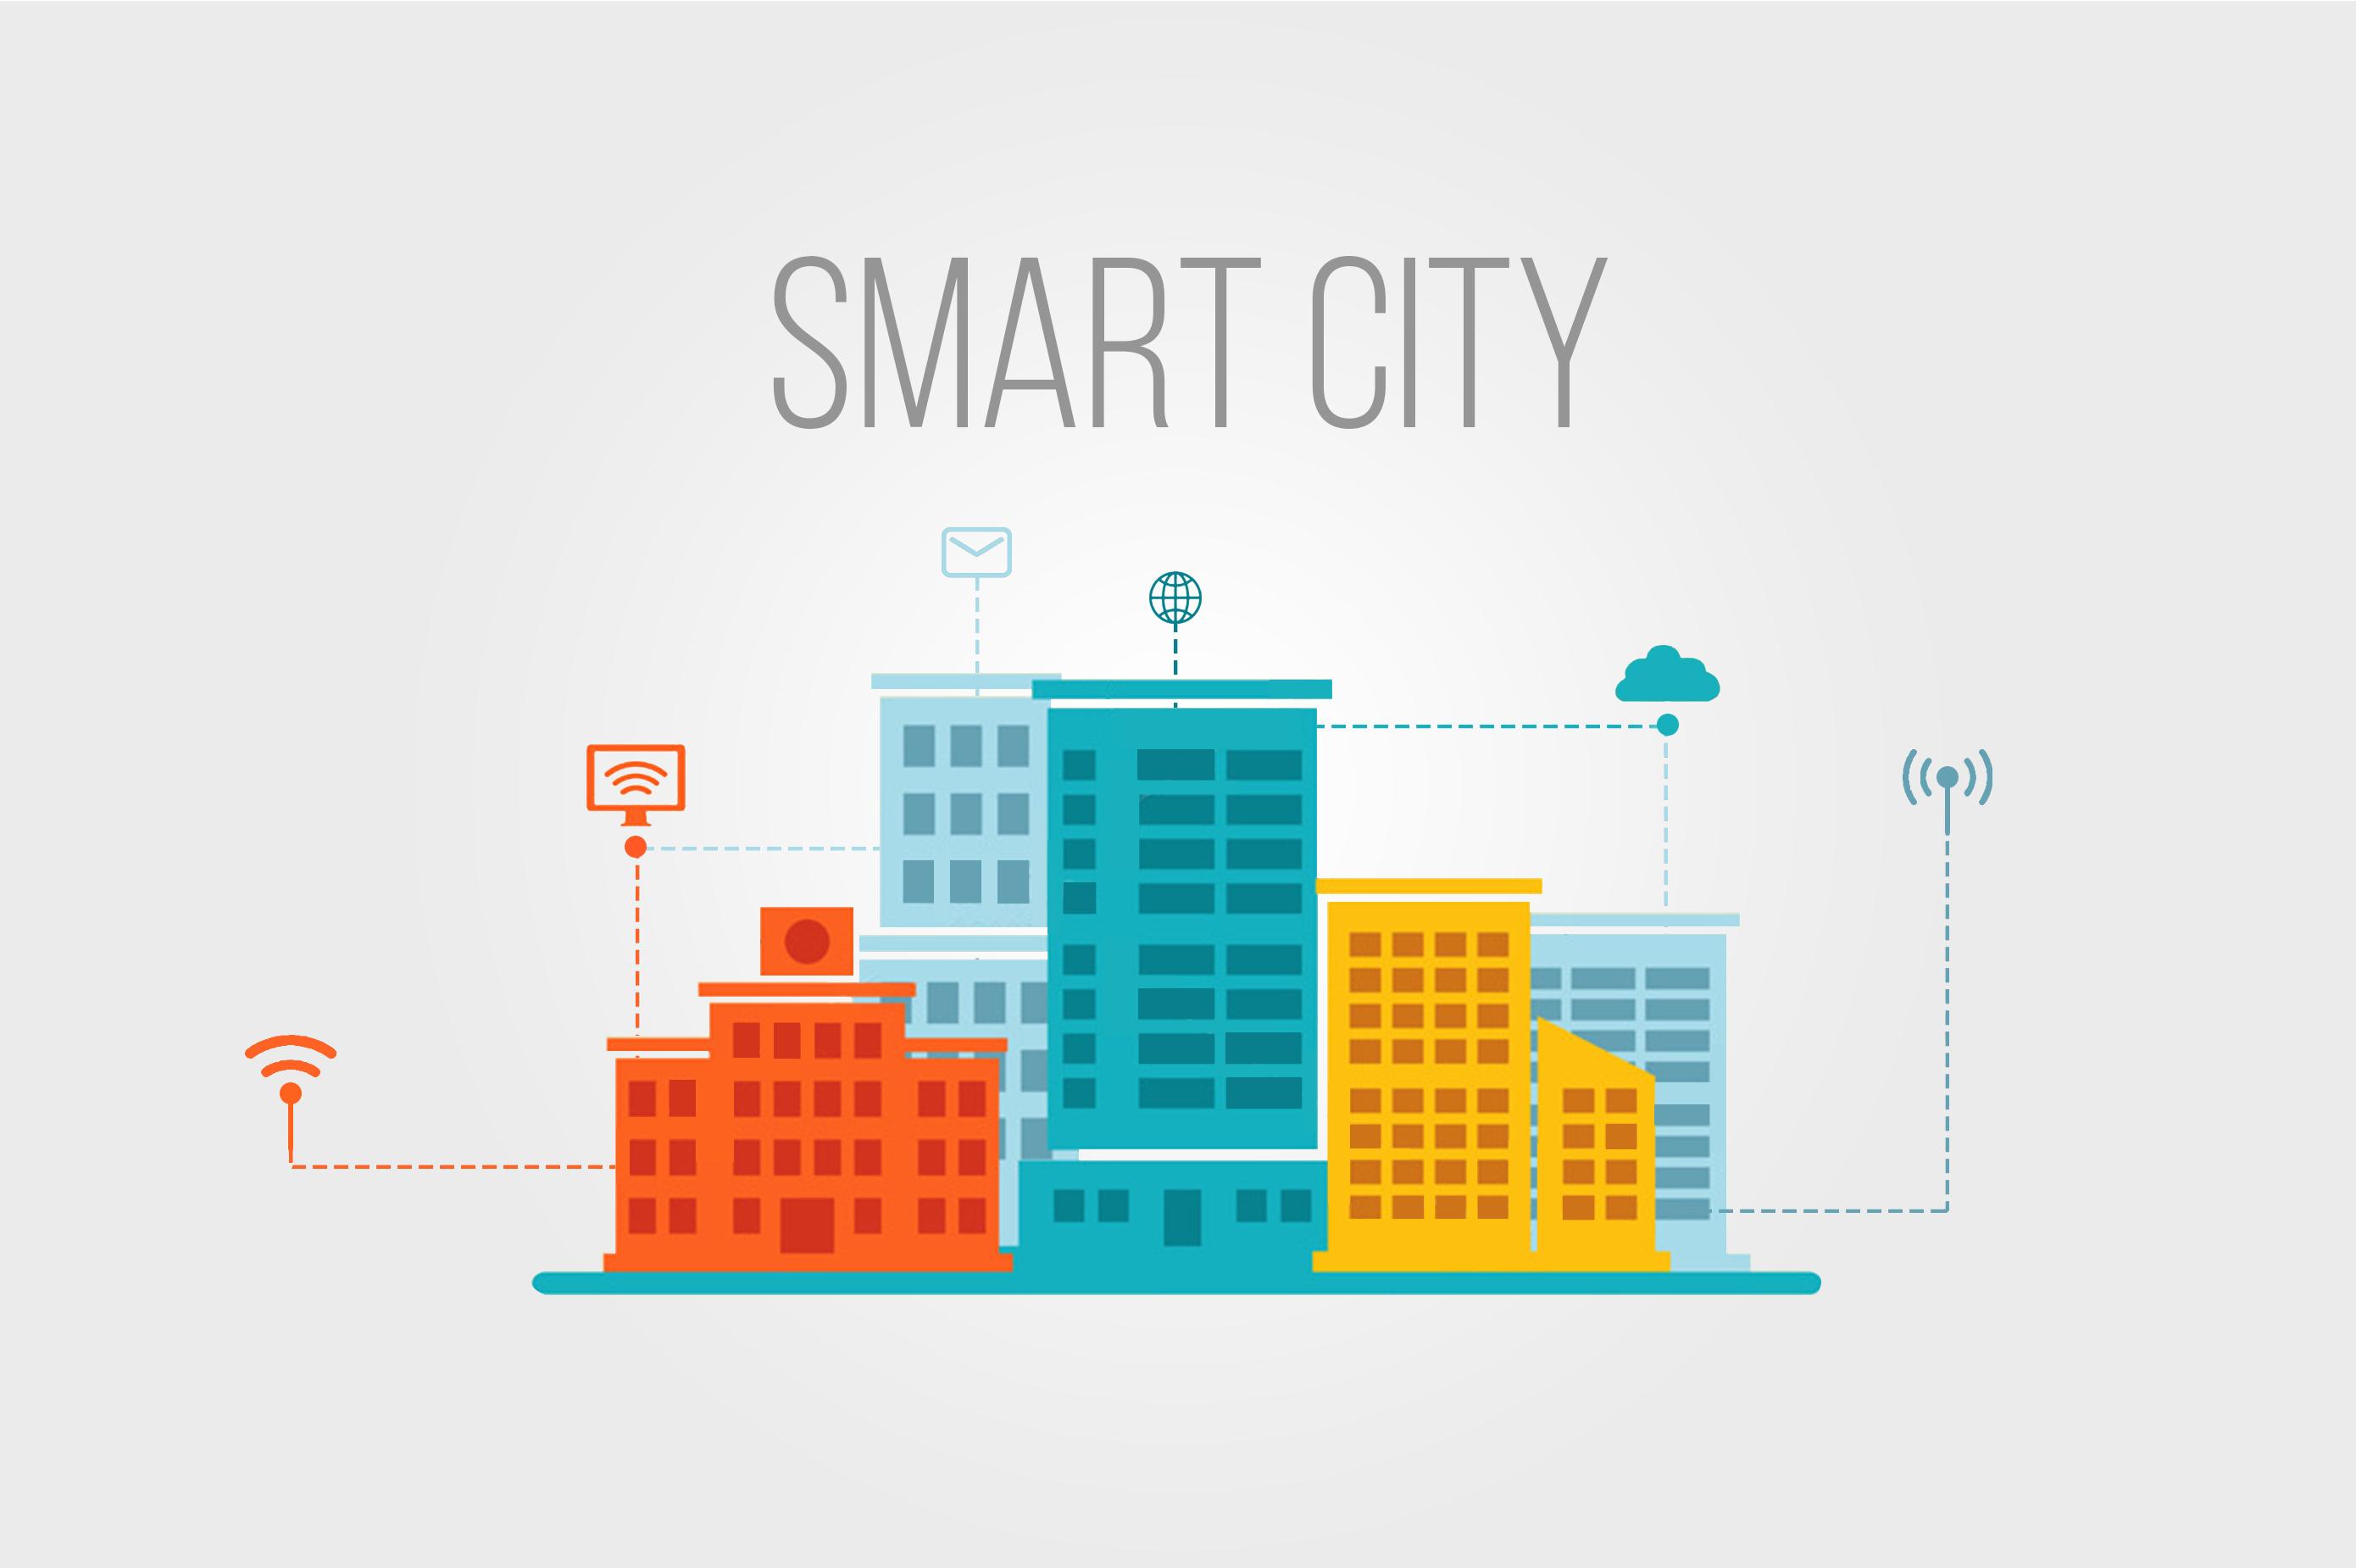 Створена робоча група «Dnipro – Smart City» за участю «Агентства розвитку Дніпра»